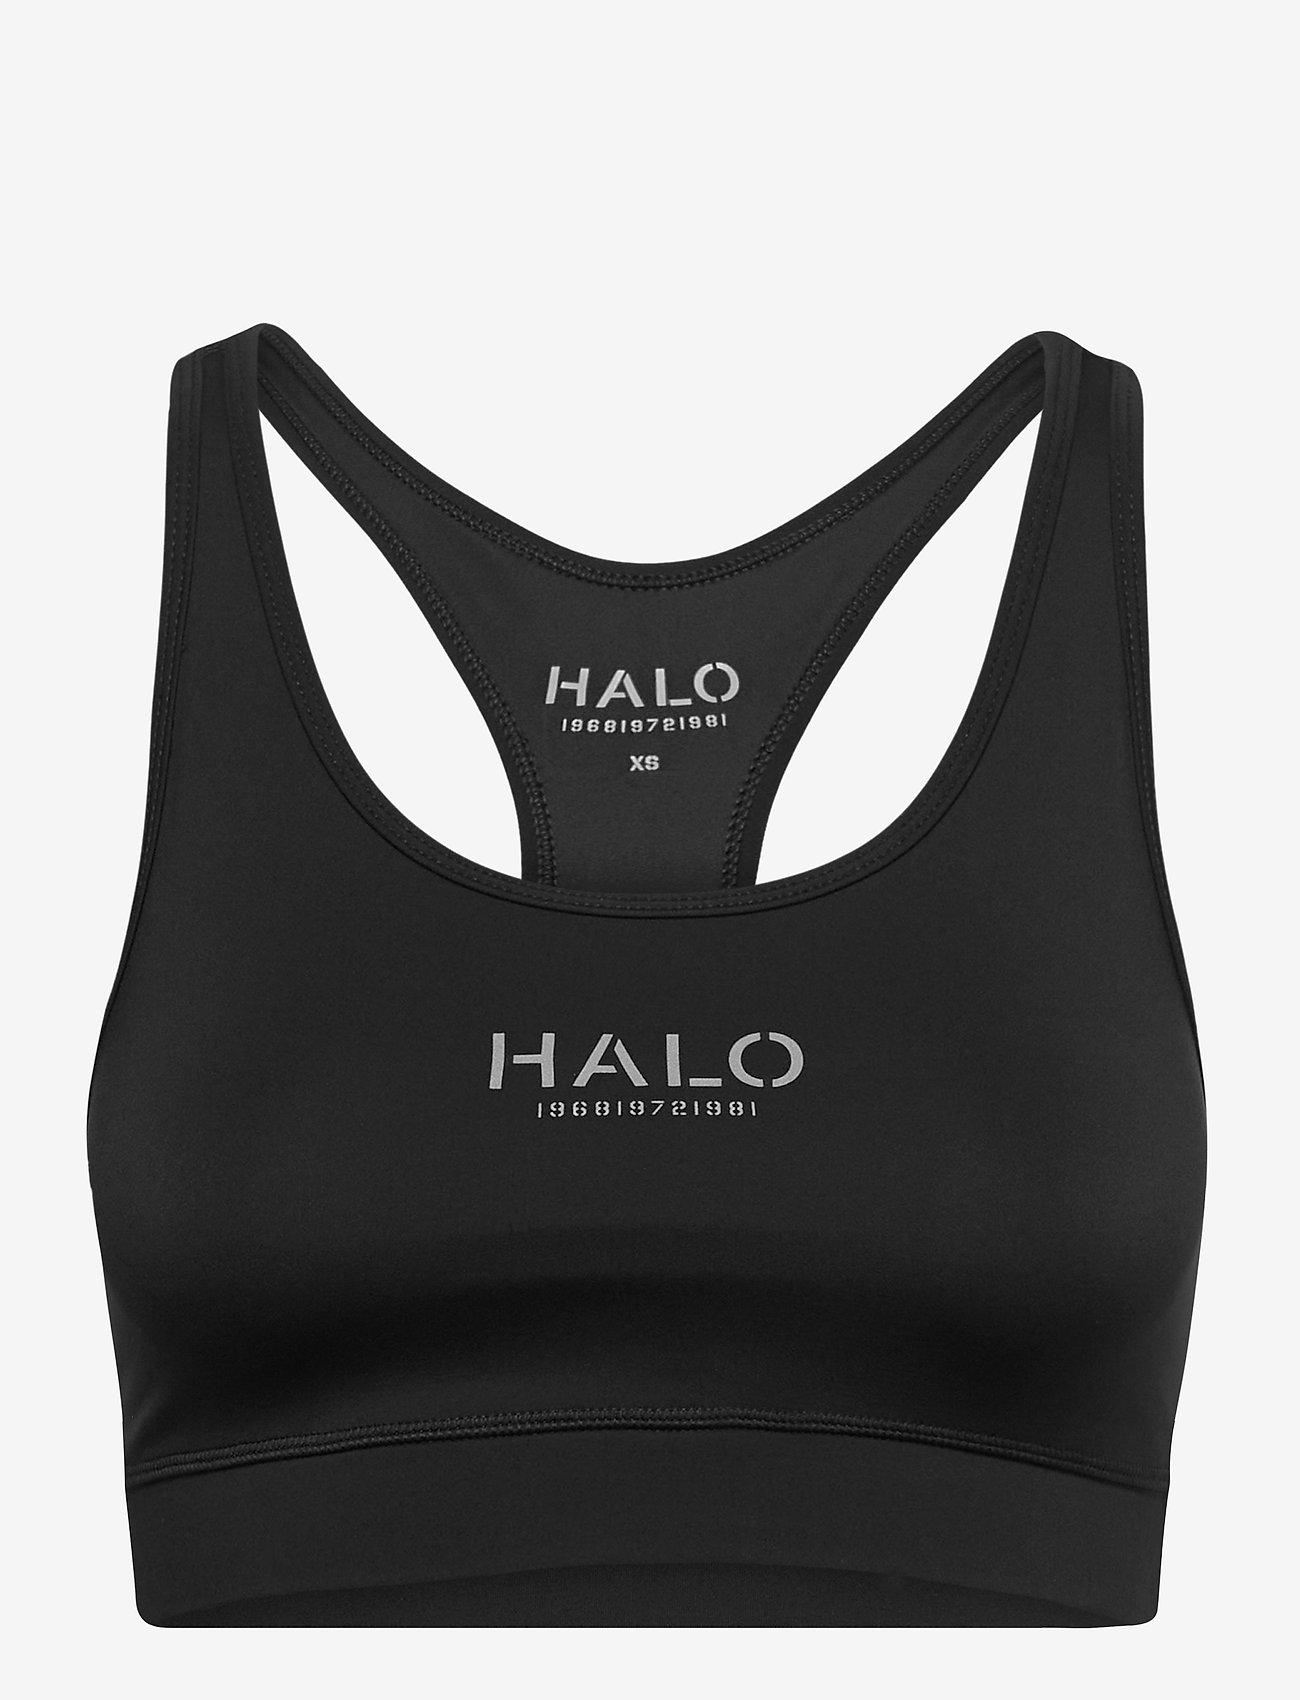 HALO - HALO WOMENS BRATOP - sort bras:high - black - 0